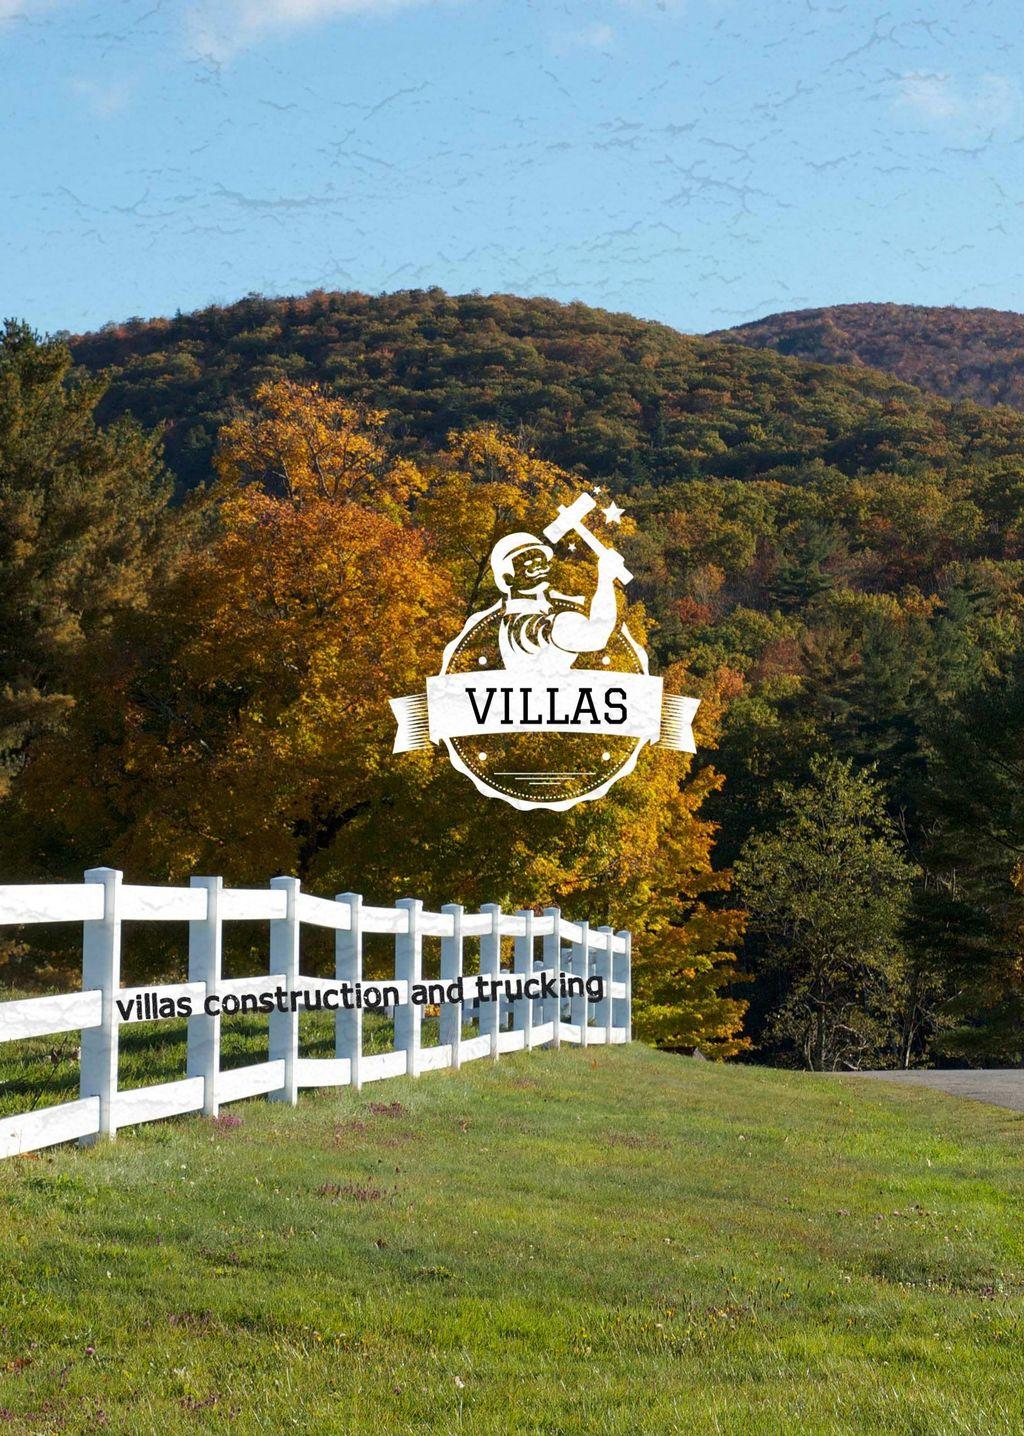 Villas construction and trucking